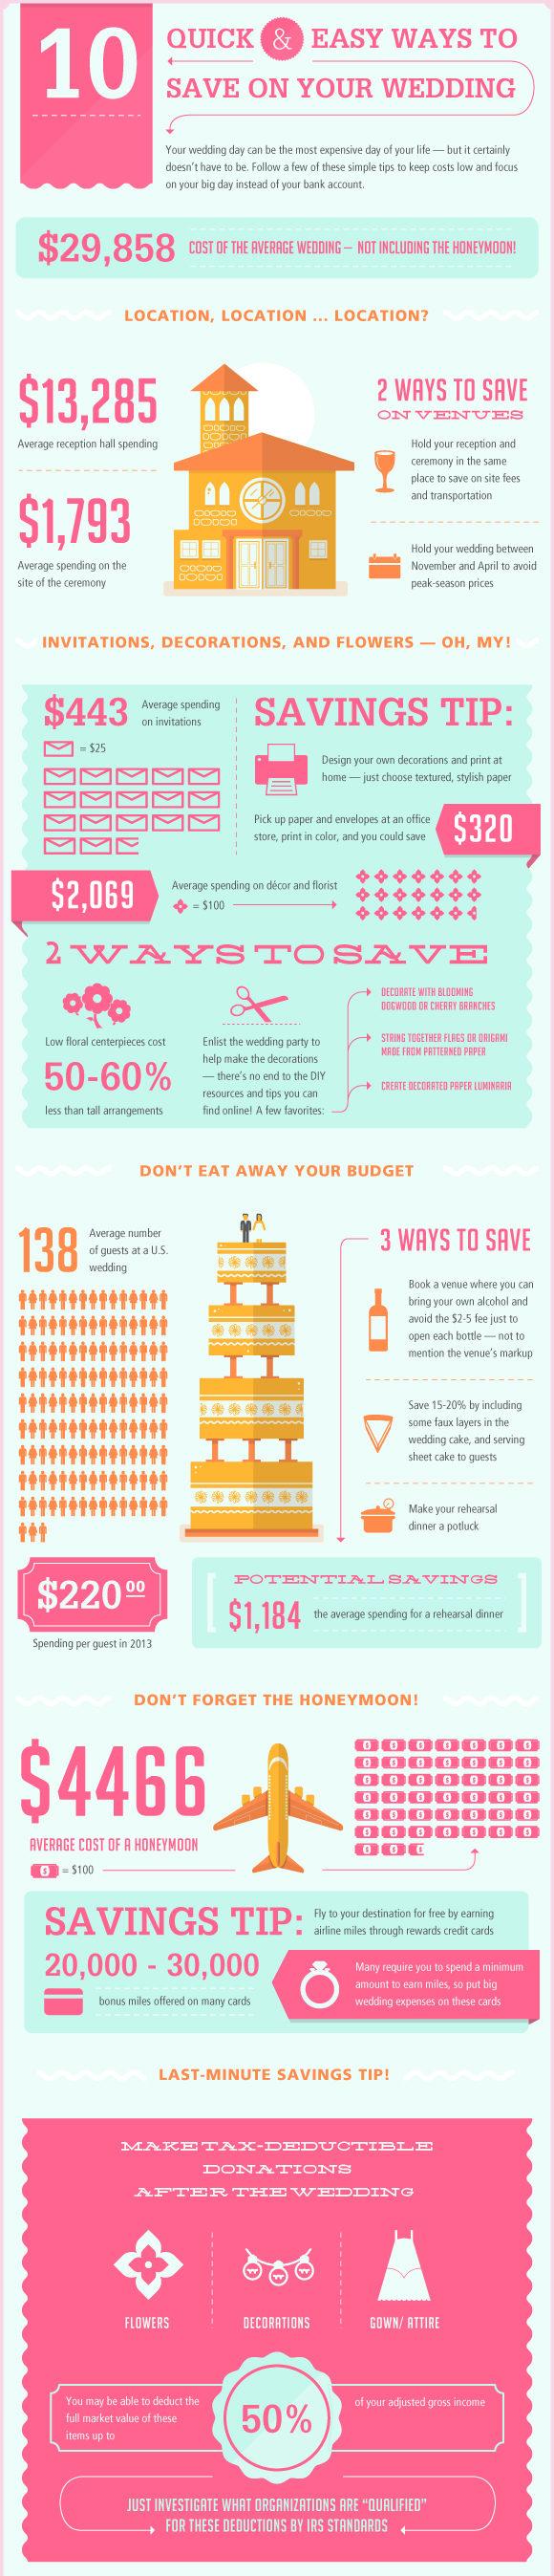 Wedding Savings Loanry